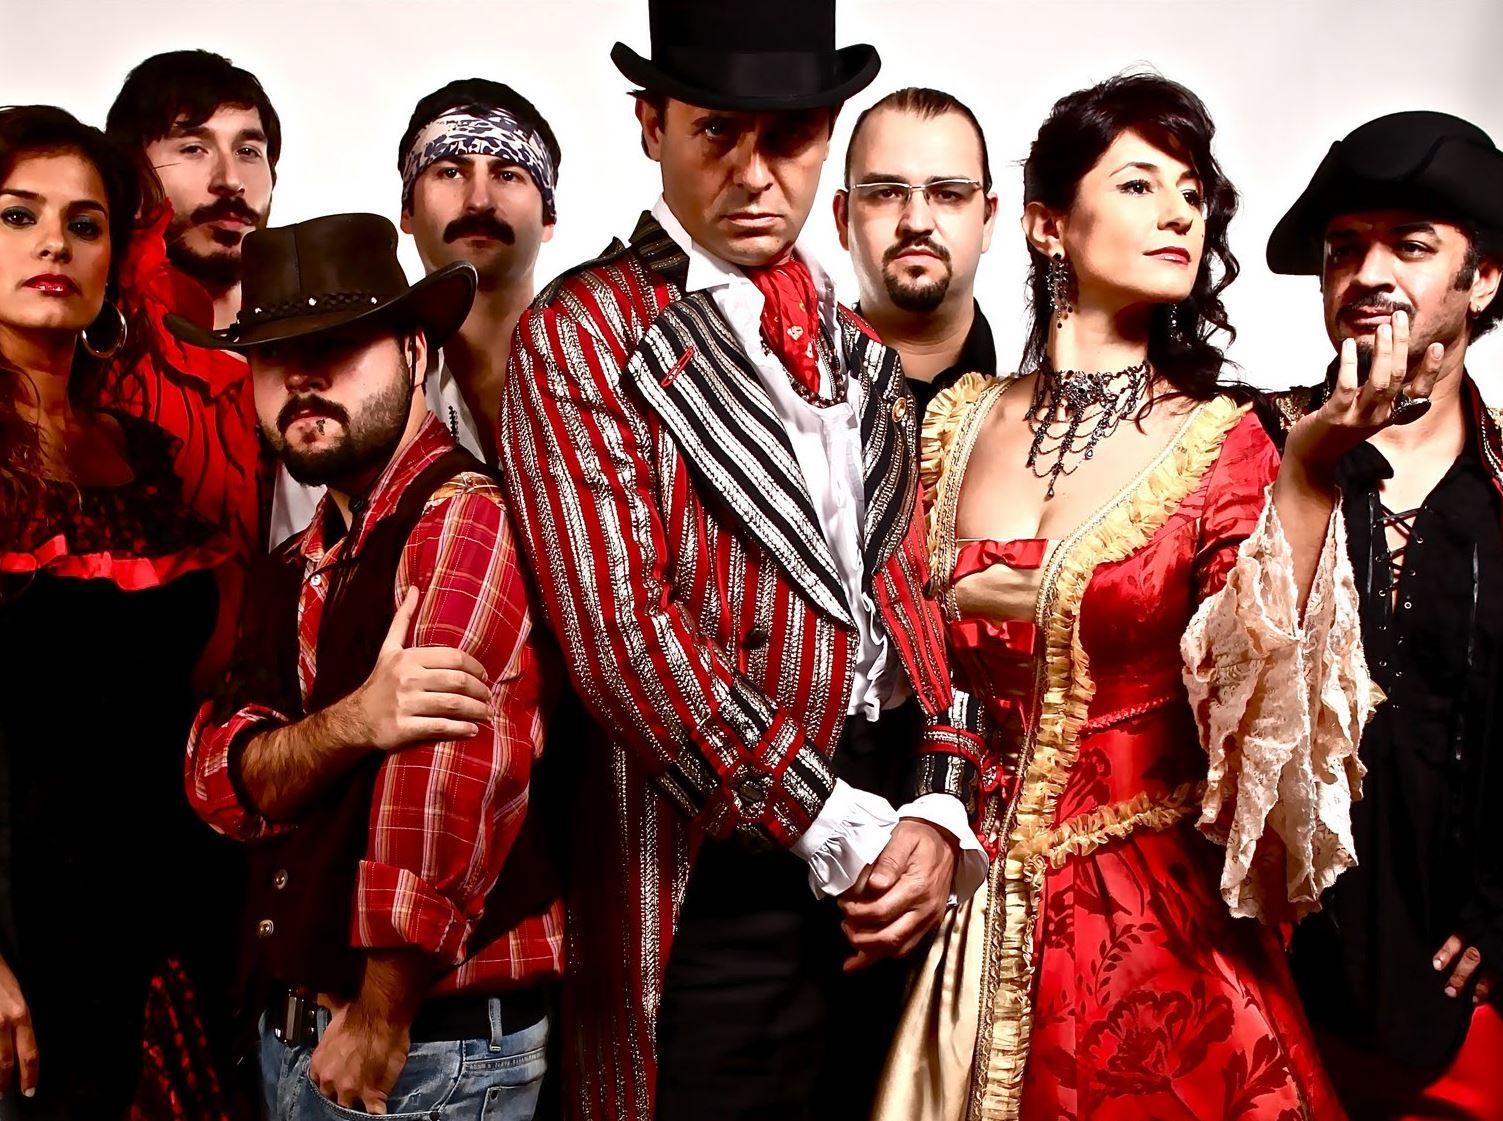 Ayhan Sicimoğlu and Latin All Stars feat. Rodrigo Rodriguez